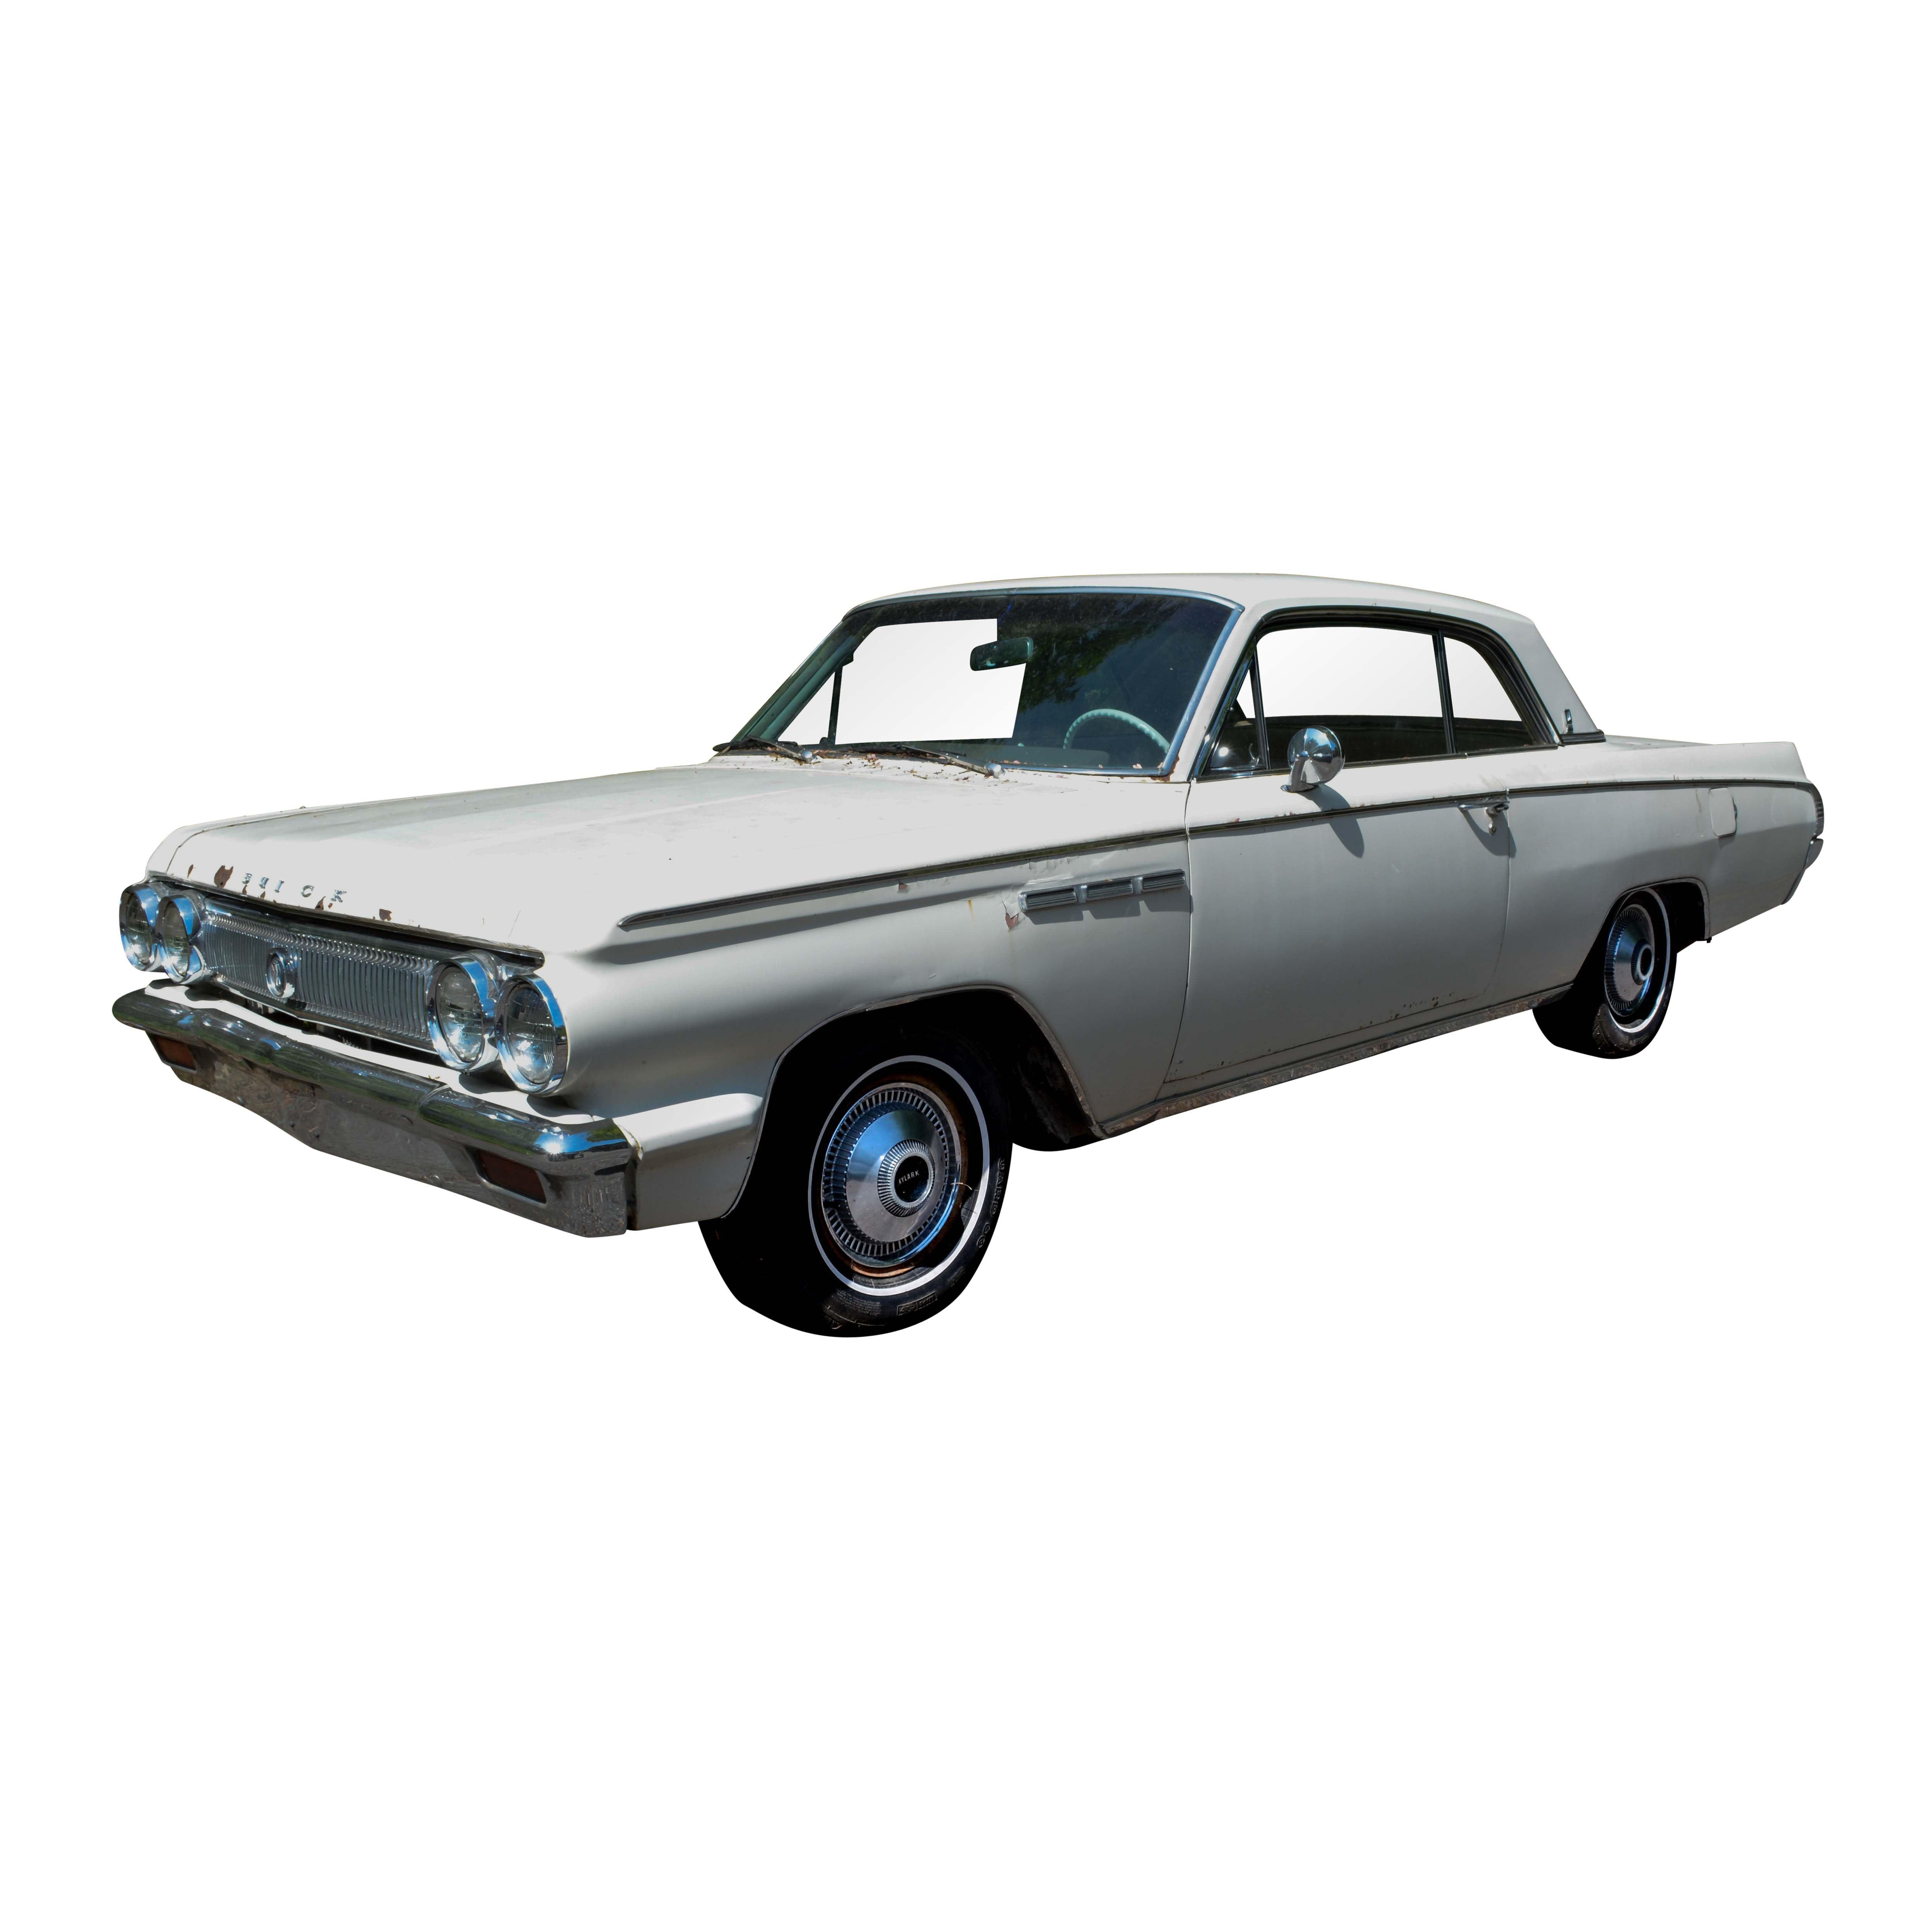 1963 Buick Skylark Hardtop Coupe